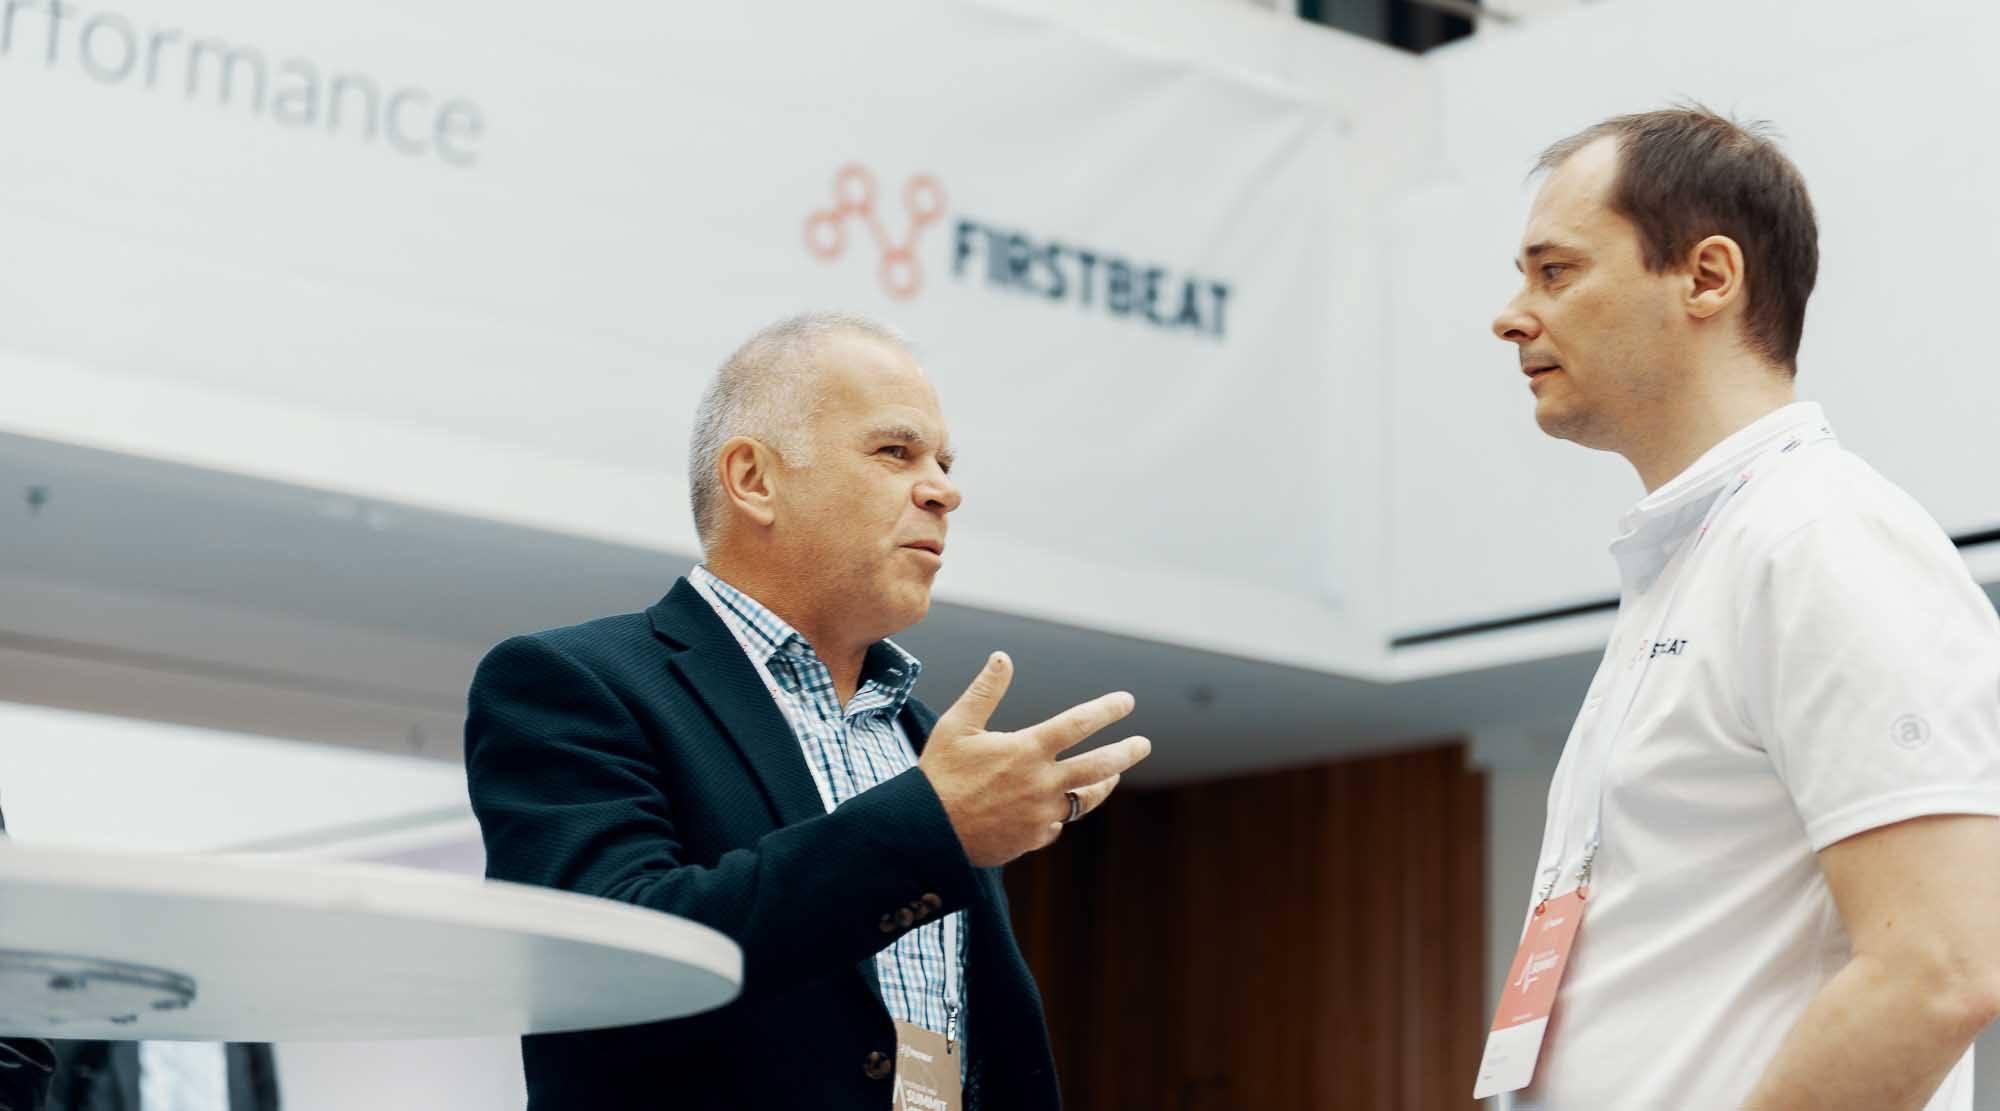 CEO Joni Kettunen in Firstbeat HRV Summit 2019